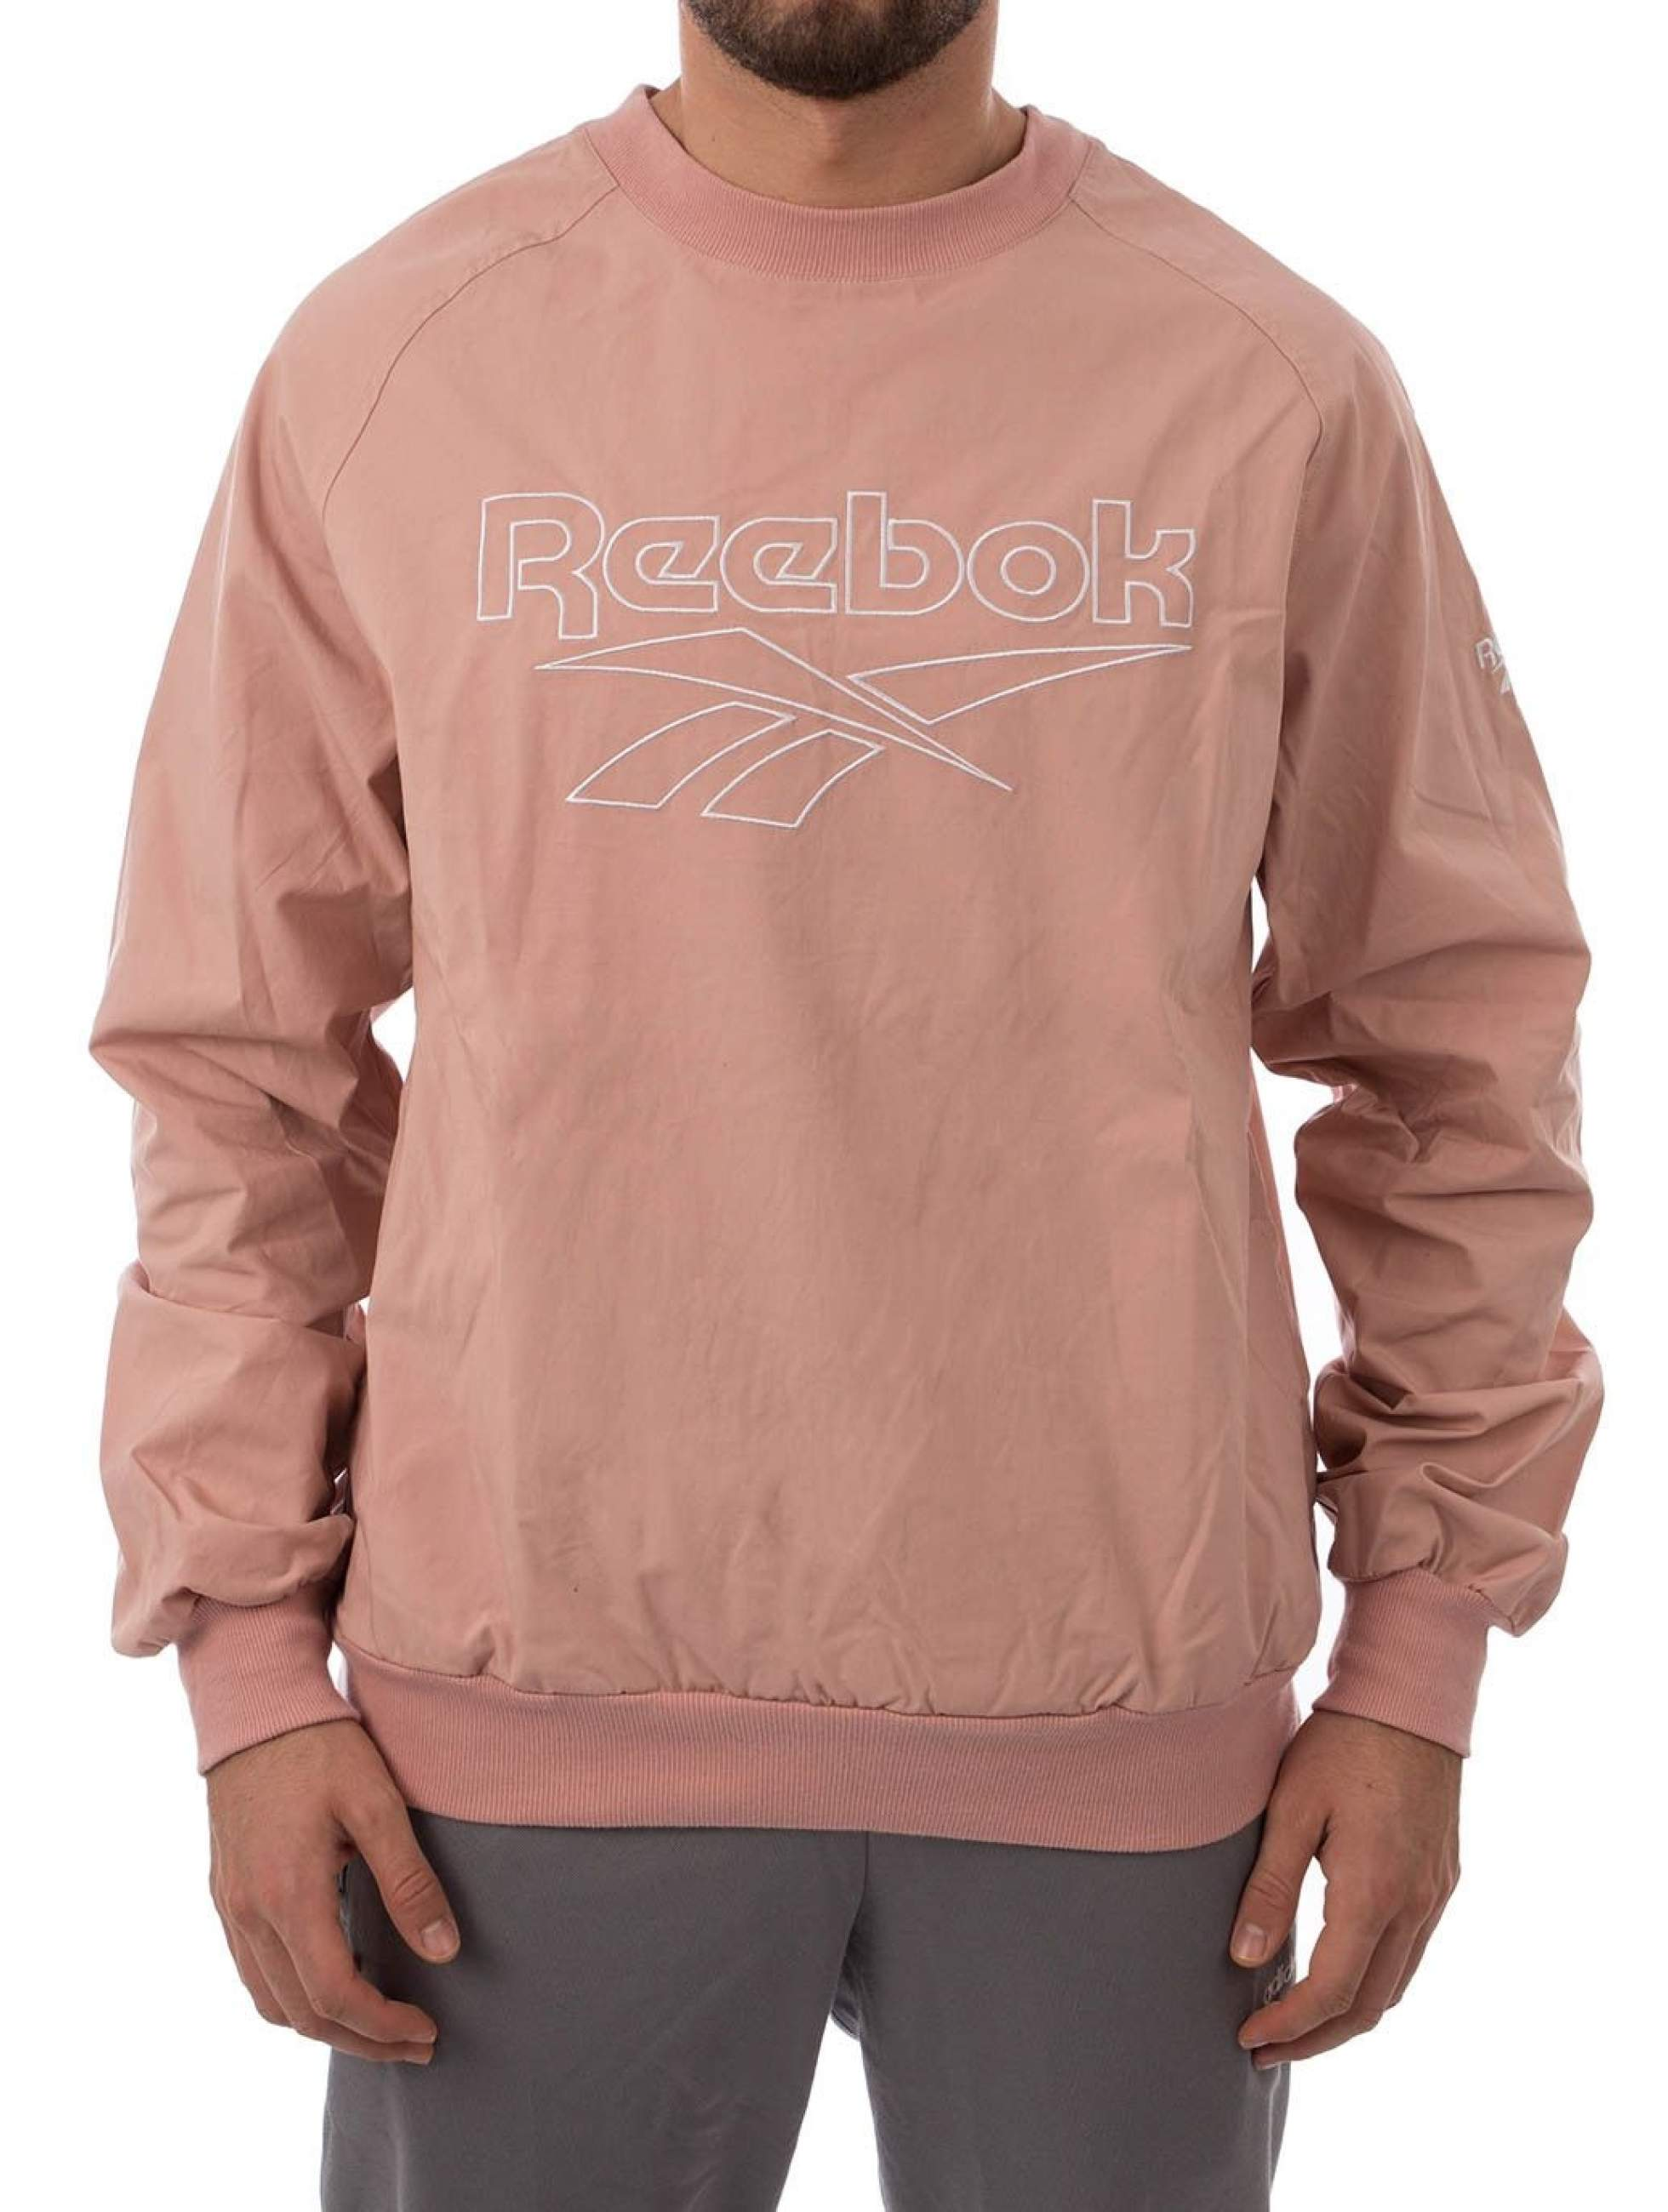 Reebok Classic V 43191 Zip Sweatshirt Black